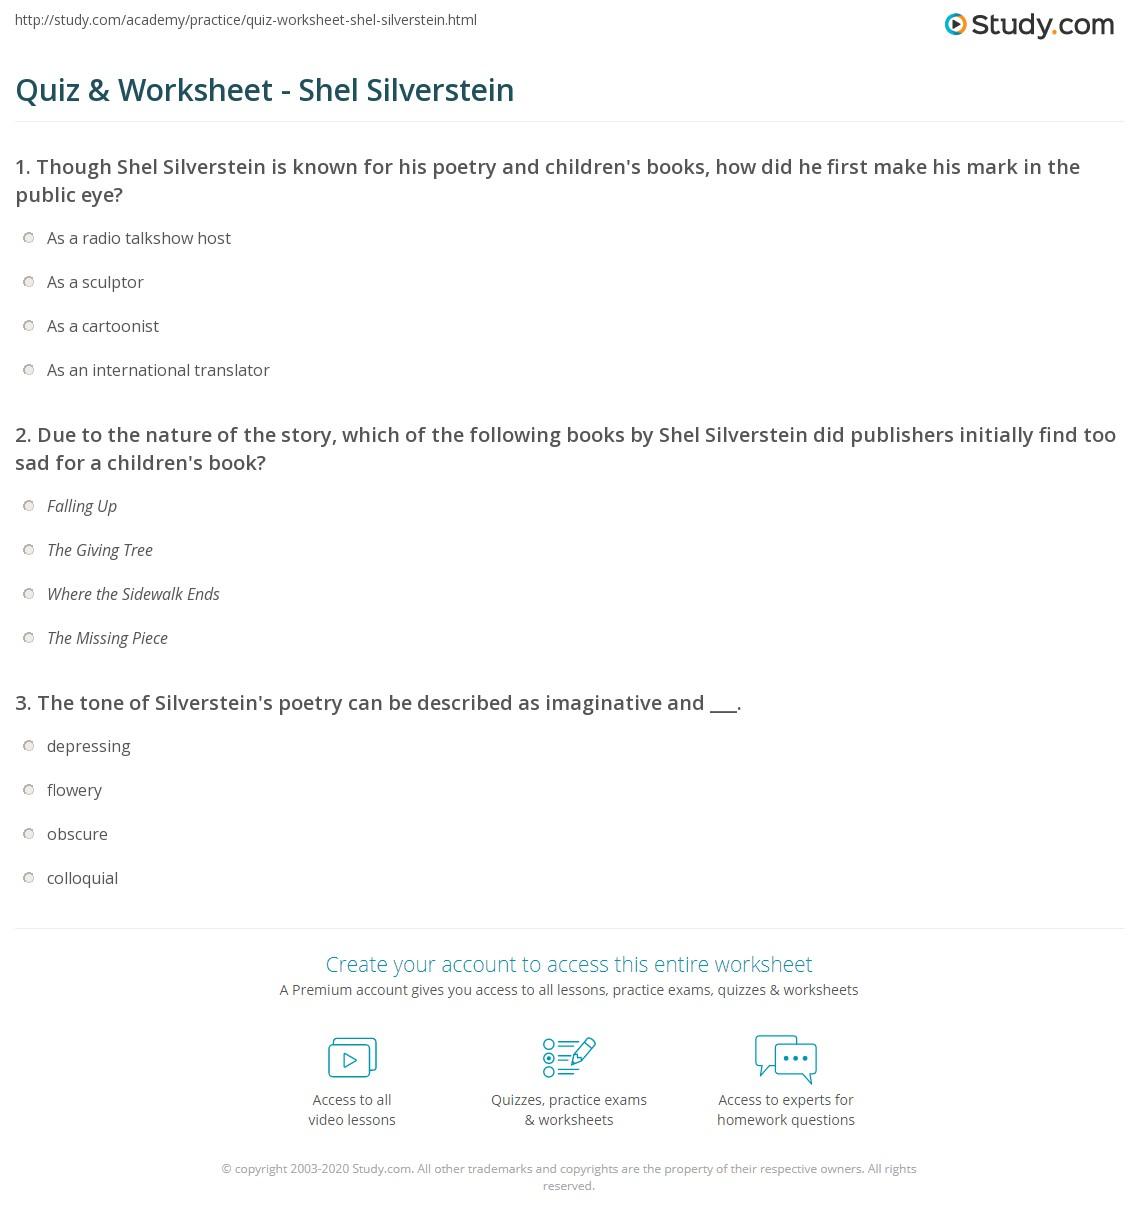 worksheet Shel Silverstein Worksheets quiz worksheet shel silverstein study com print biography poems books worksheet